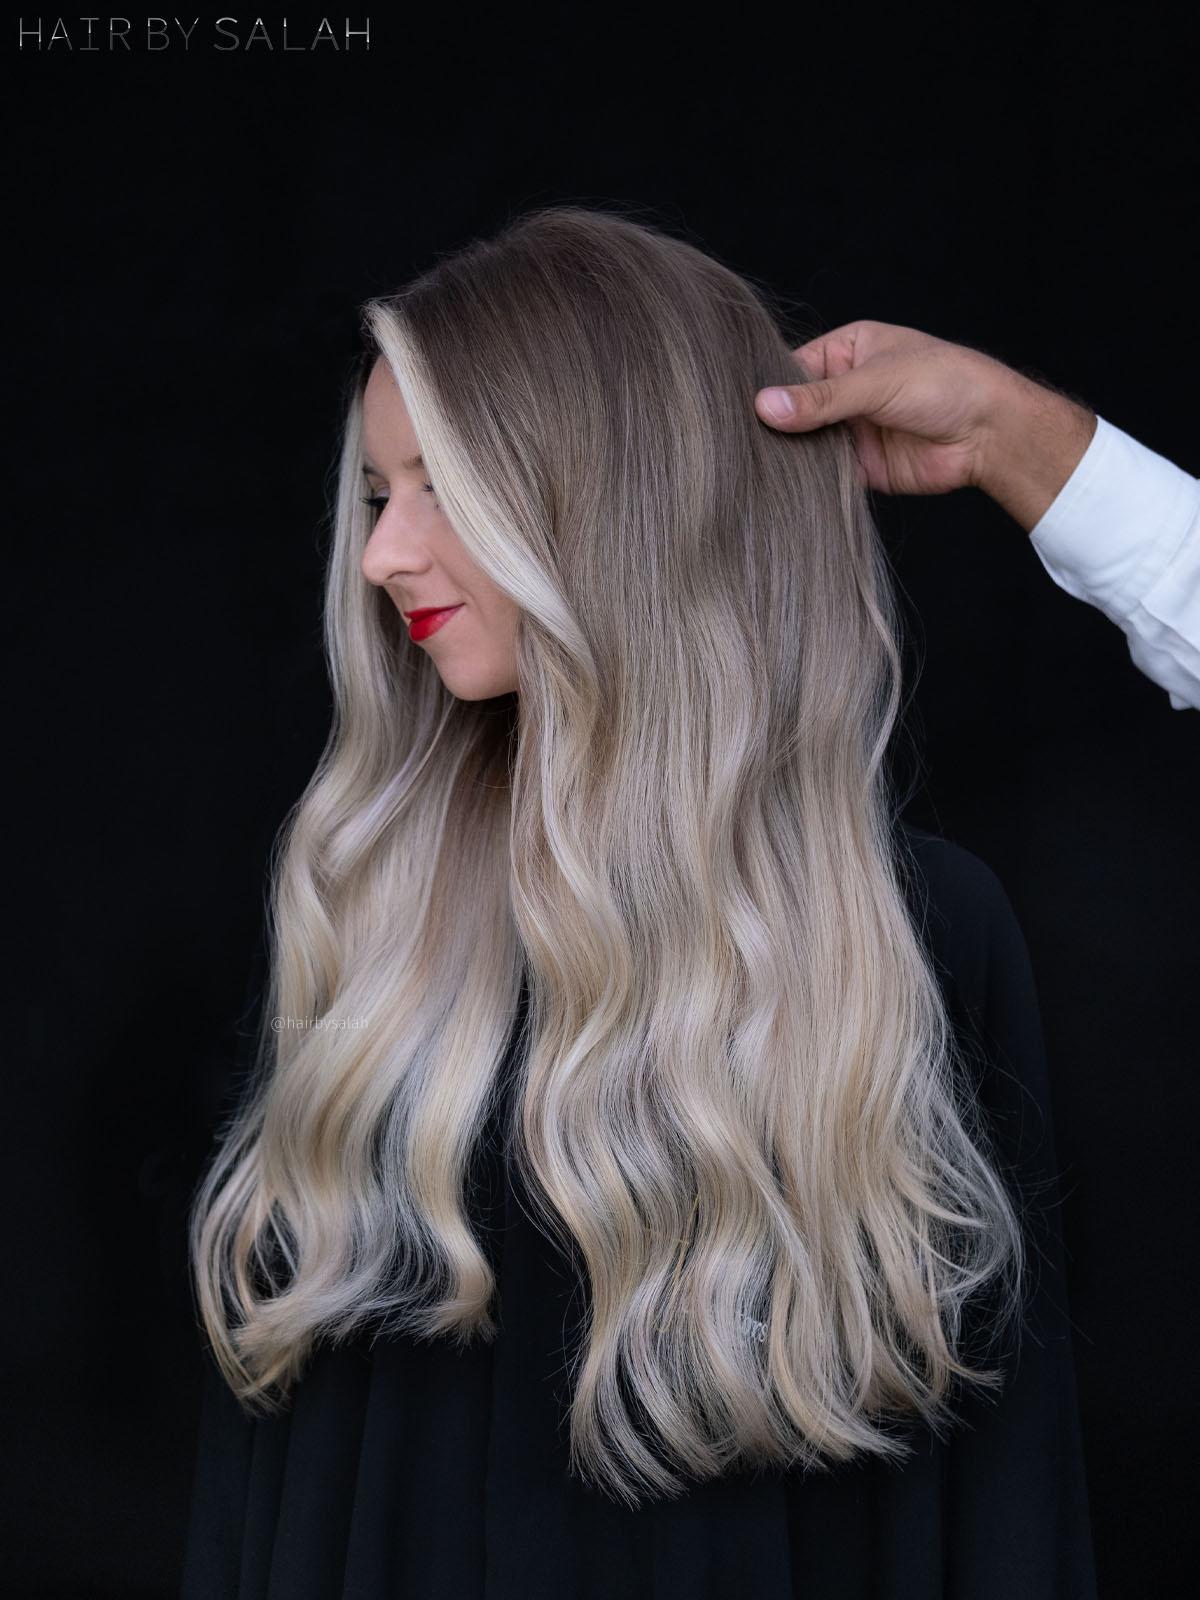 Ice Blonde Balayage by Salah & Hair Creators Color Team. #iceblondehair #iceblonde #iceblondebalayage